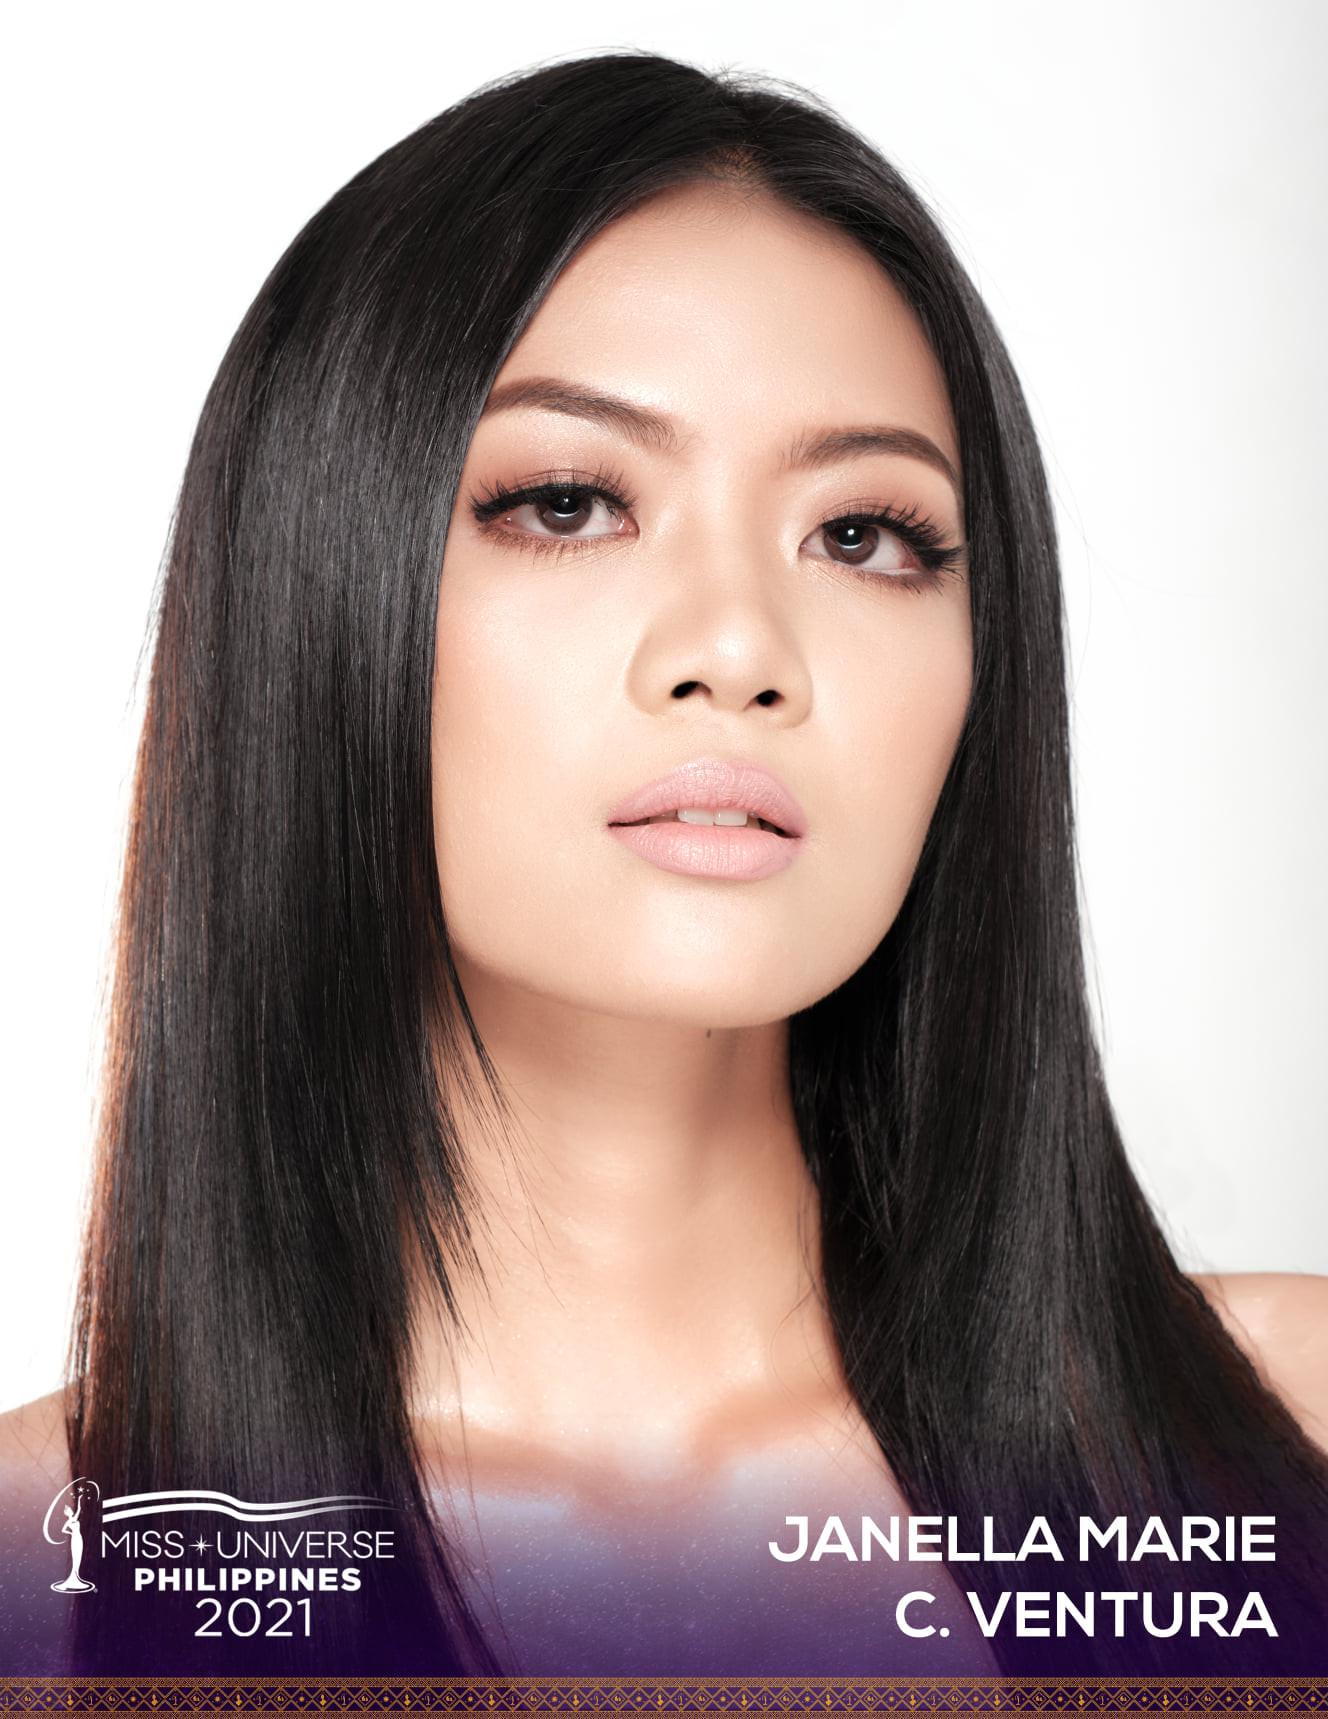 pre-candidatas a miss universe philippines 2021. - Página 4 AlRDnS